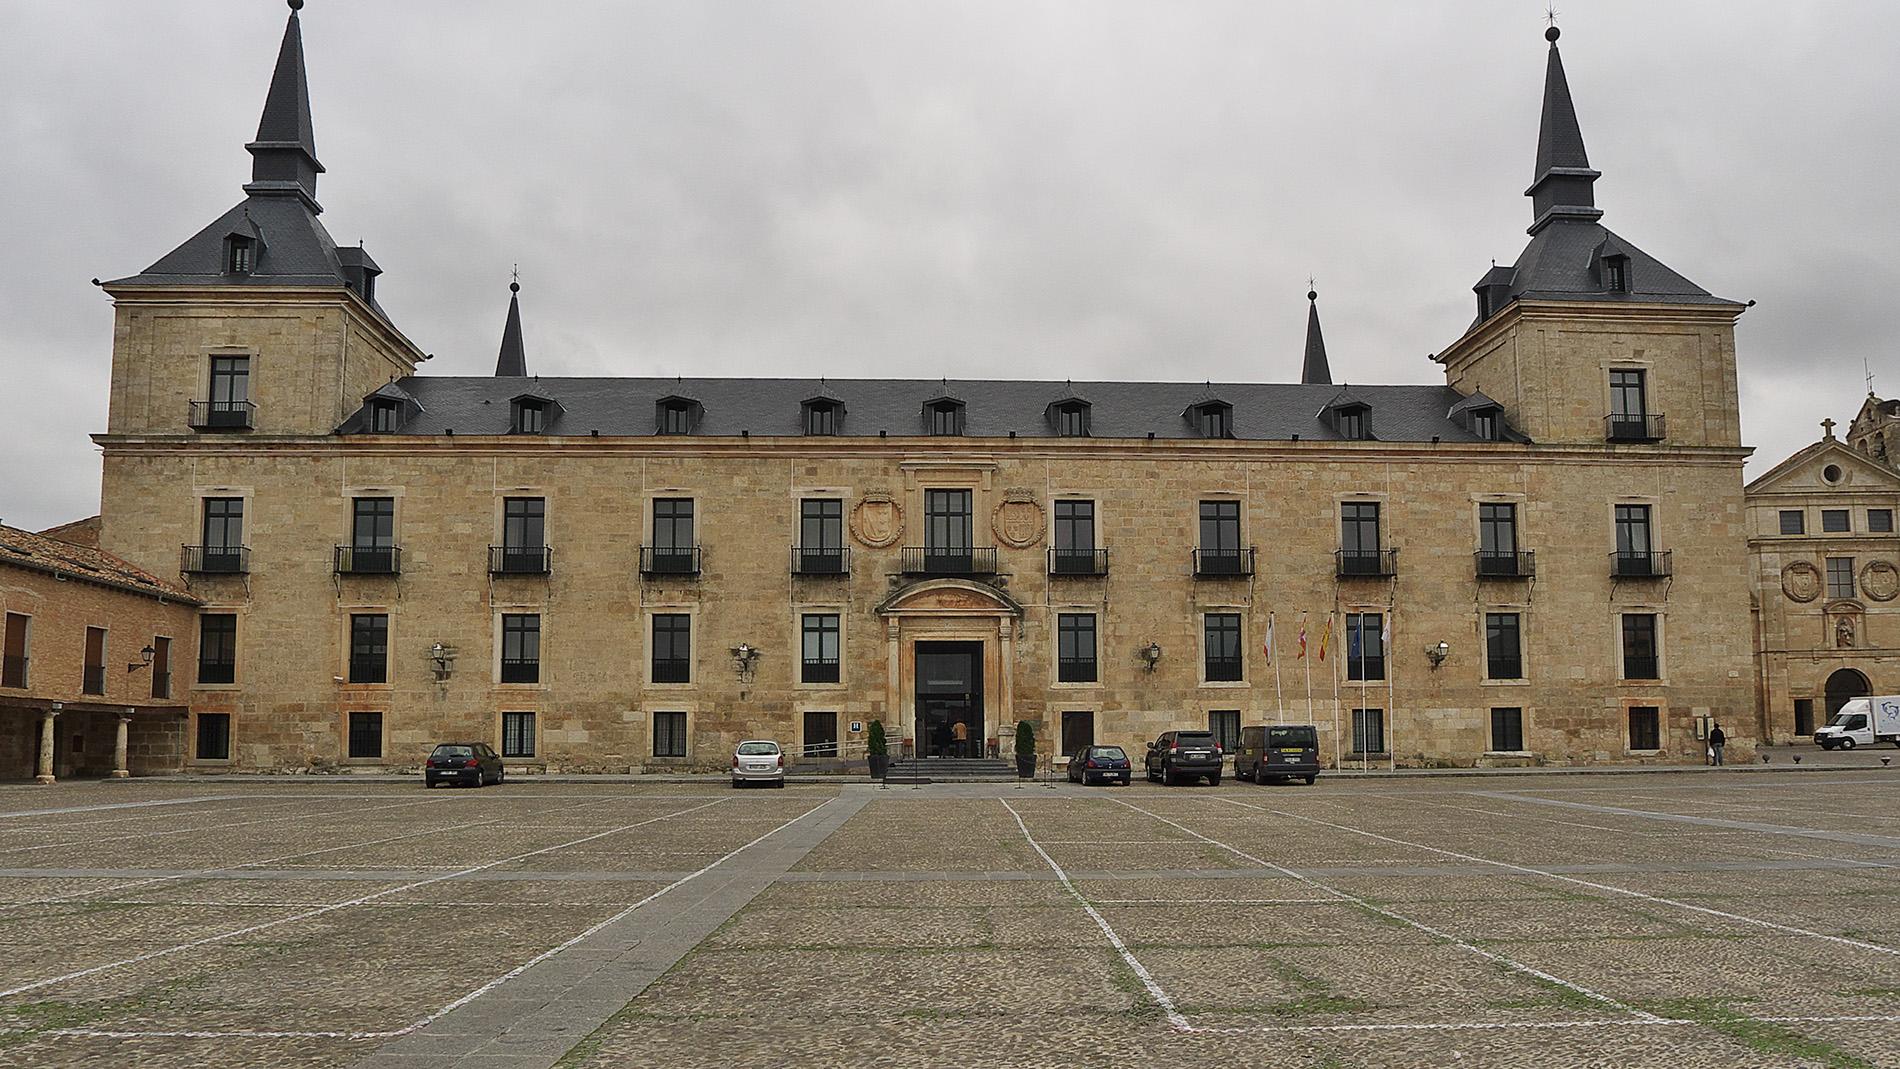 Palacio_Ducal_de_Lerma_Burgos._Fachada